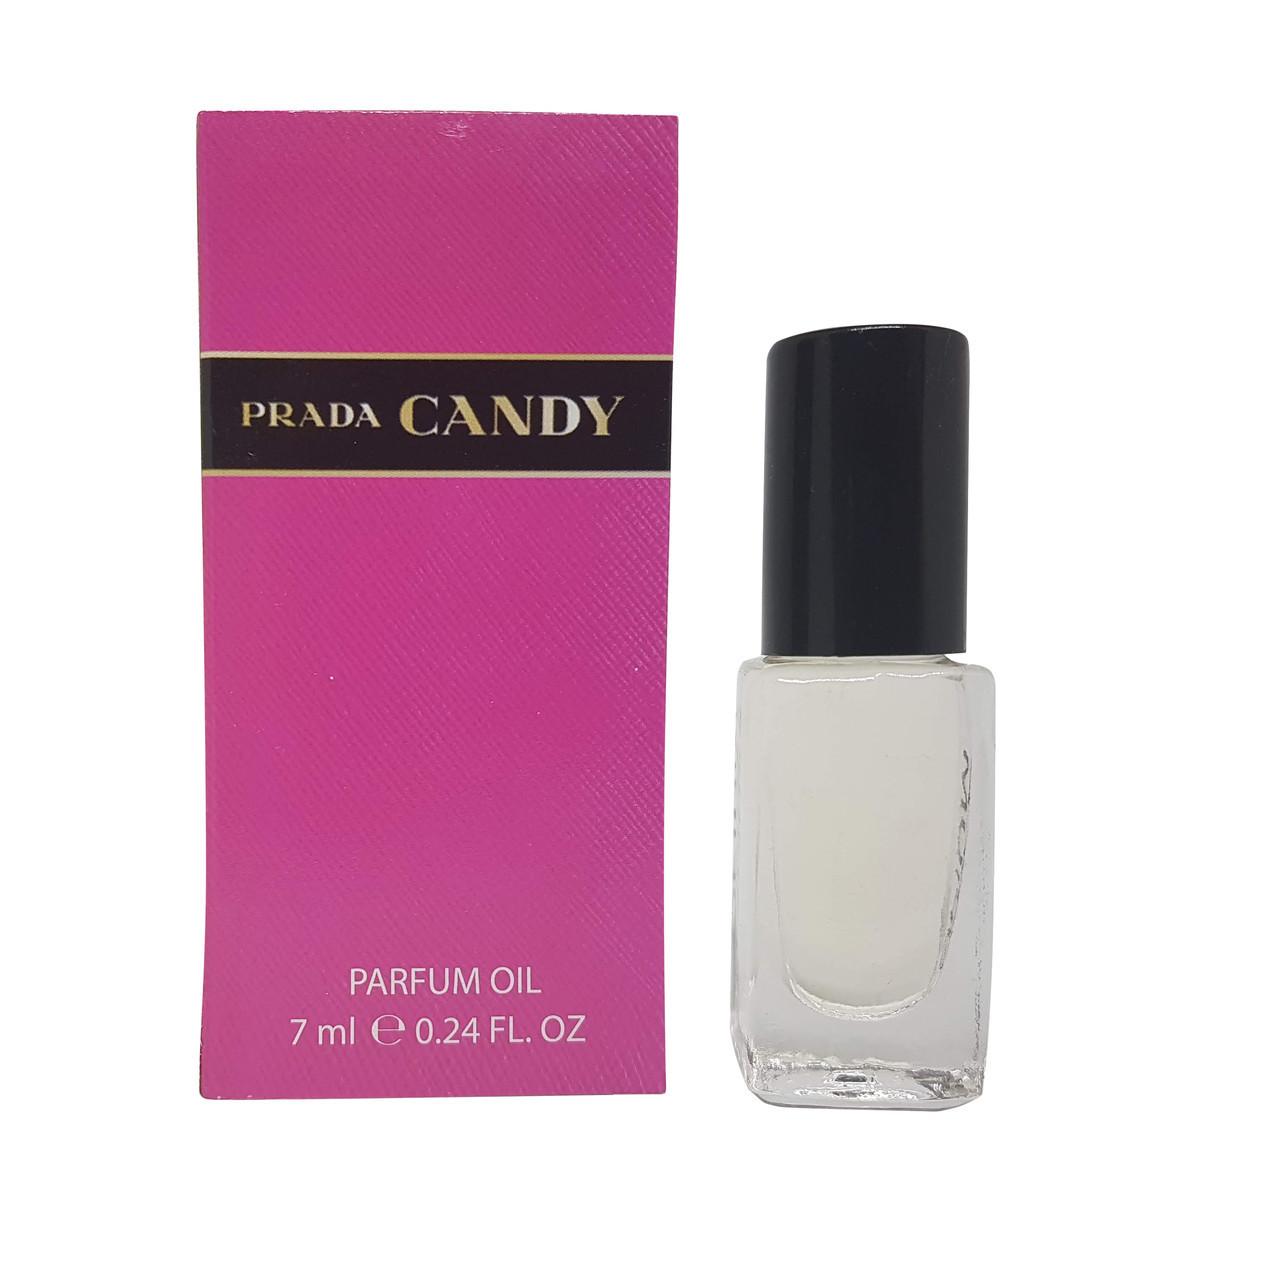 Prada Candy - Parfum oil 7ml